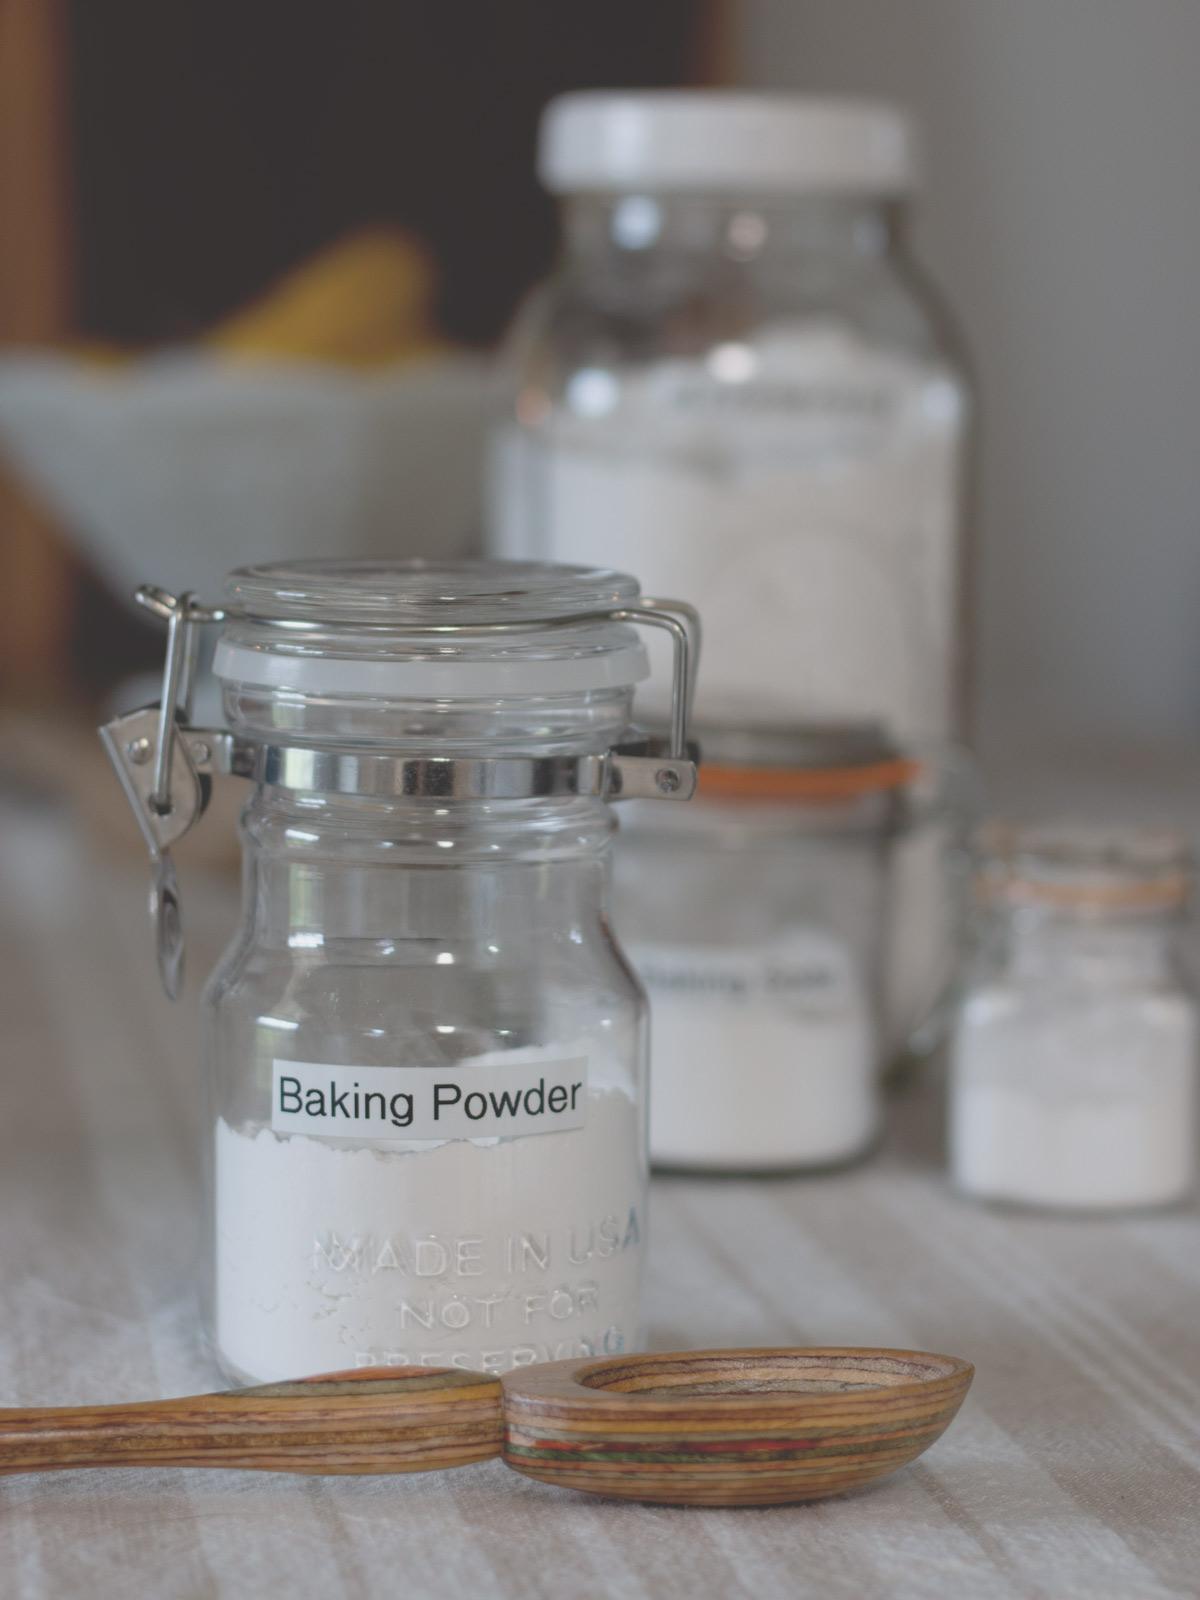 How to Make Gluten Free (Grain Free) Baking Powder